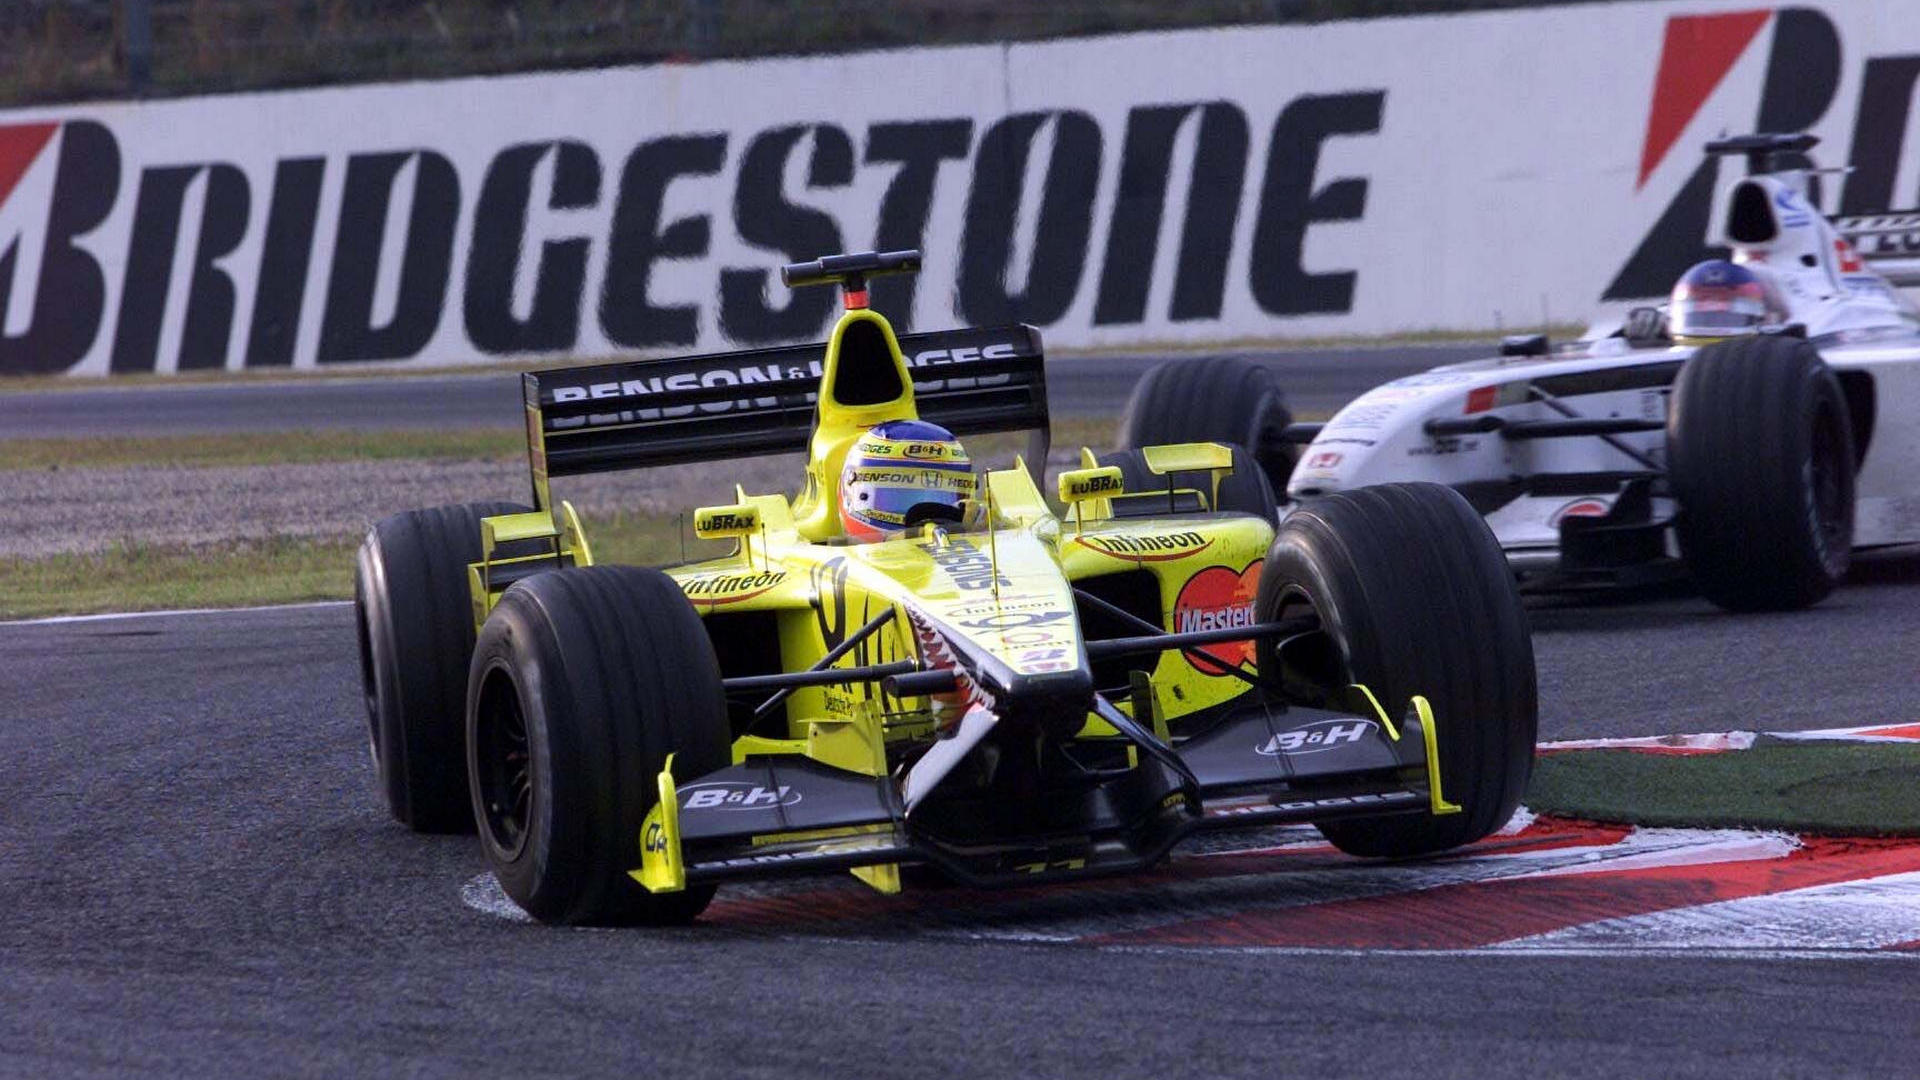 HD Wallpapers 2001 Formula 1 Grand Prix Of Japan F1